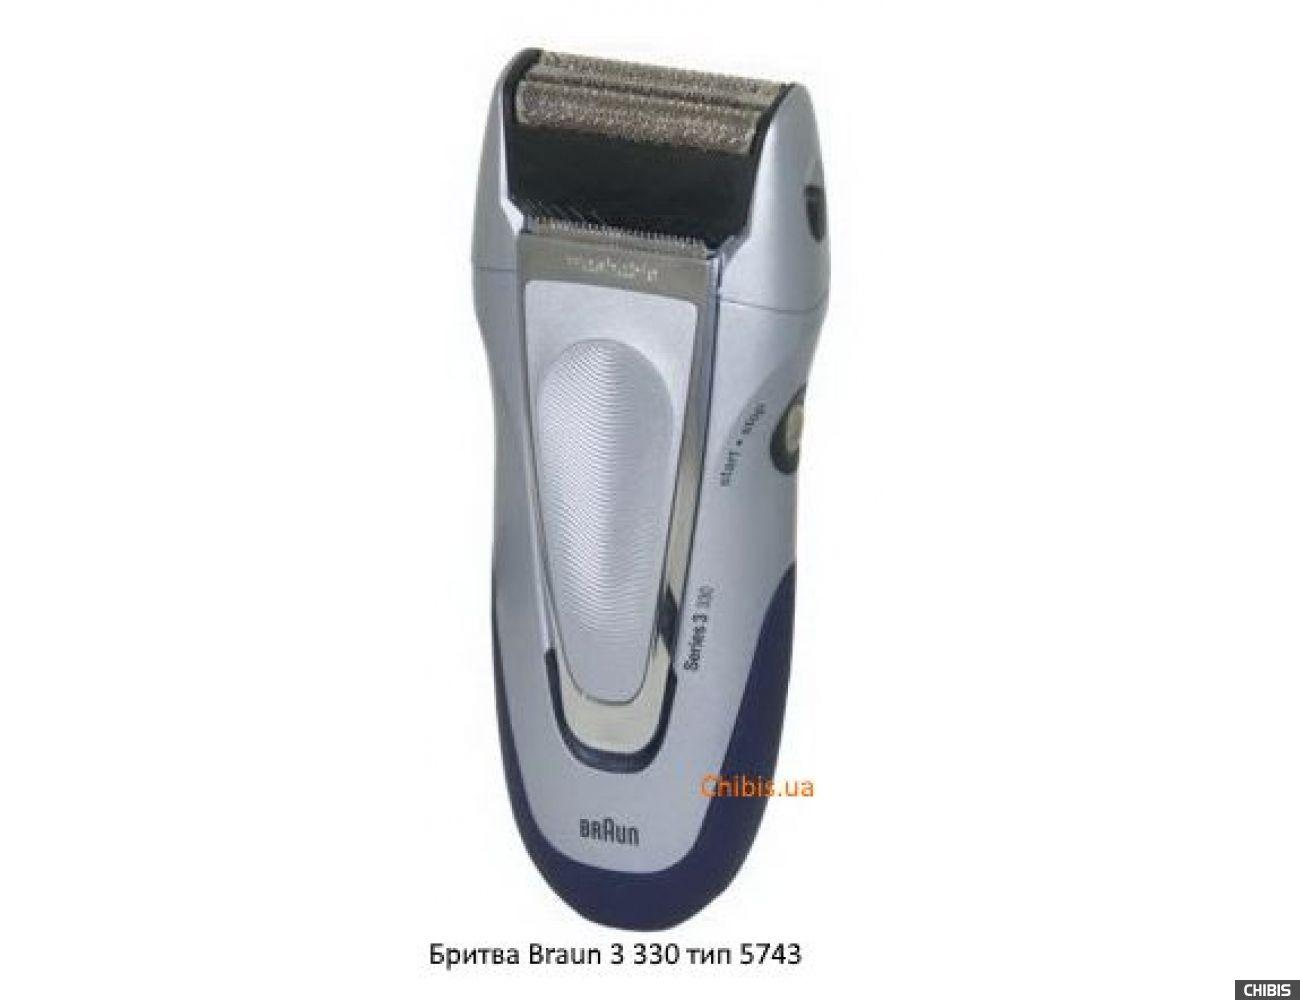 Braun 330 series 3 тип 574